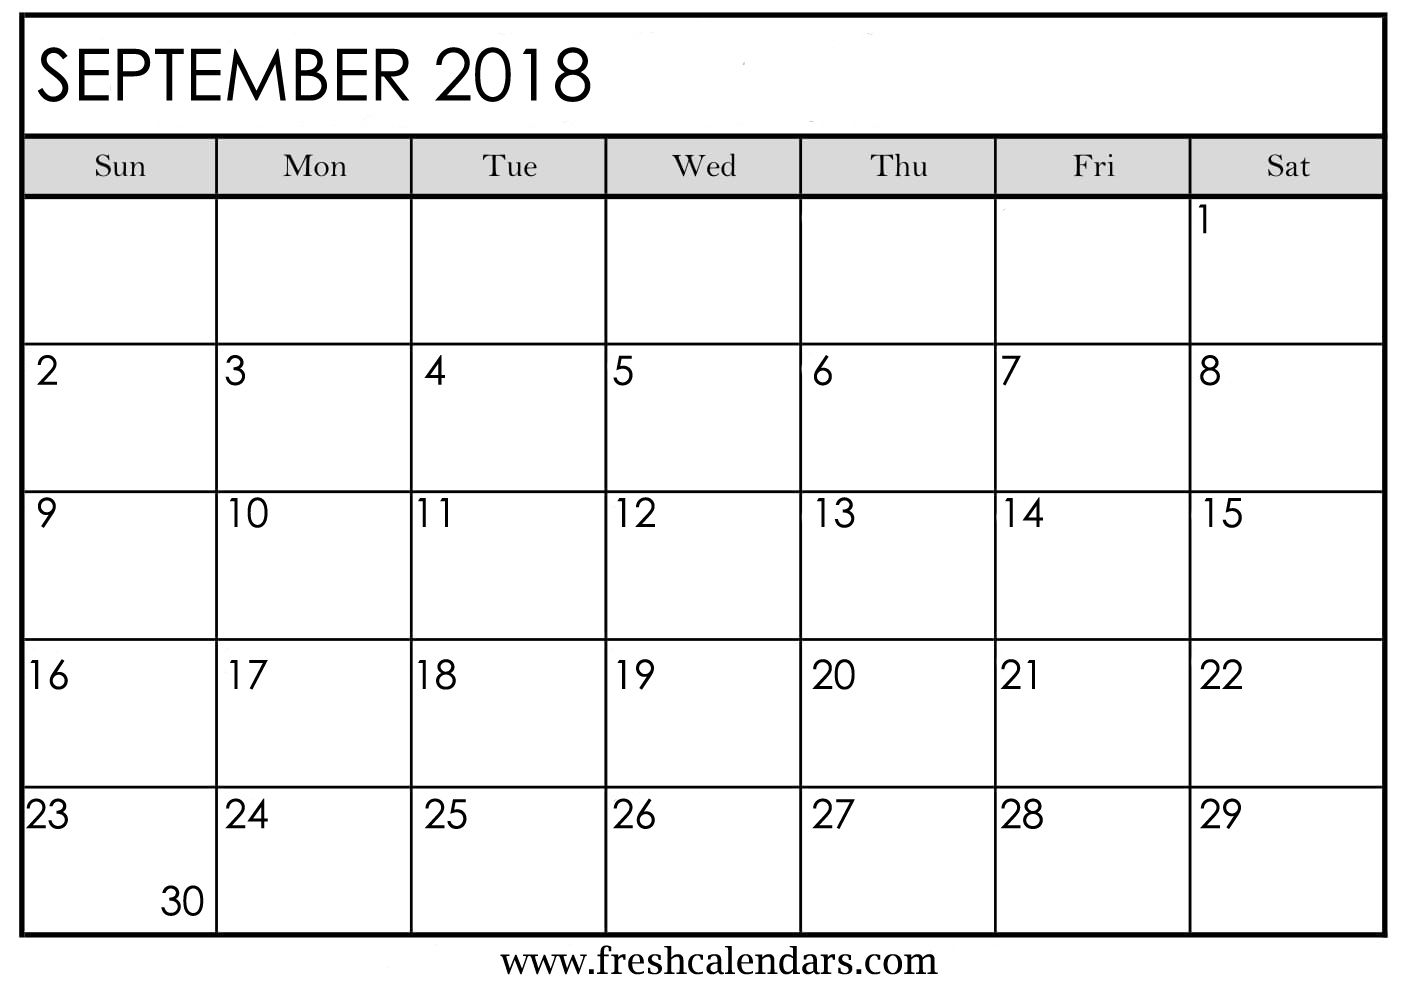 September 2018 Calendar Printable - Fresh Calendars in September Calendar Printable Template